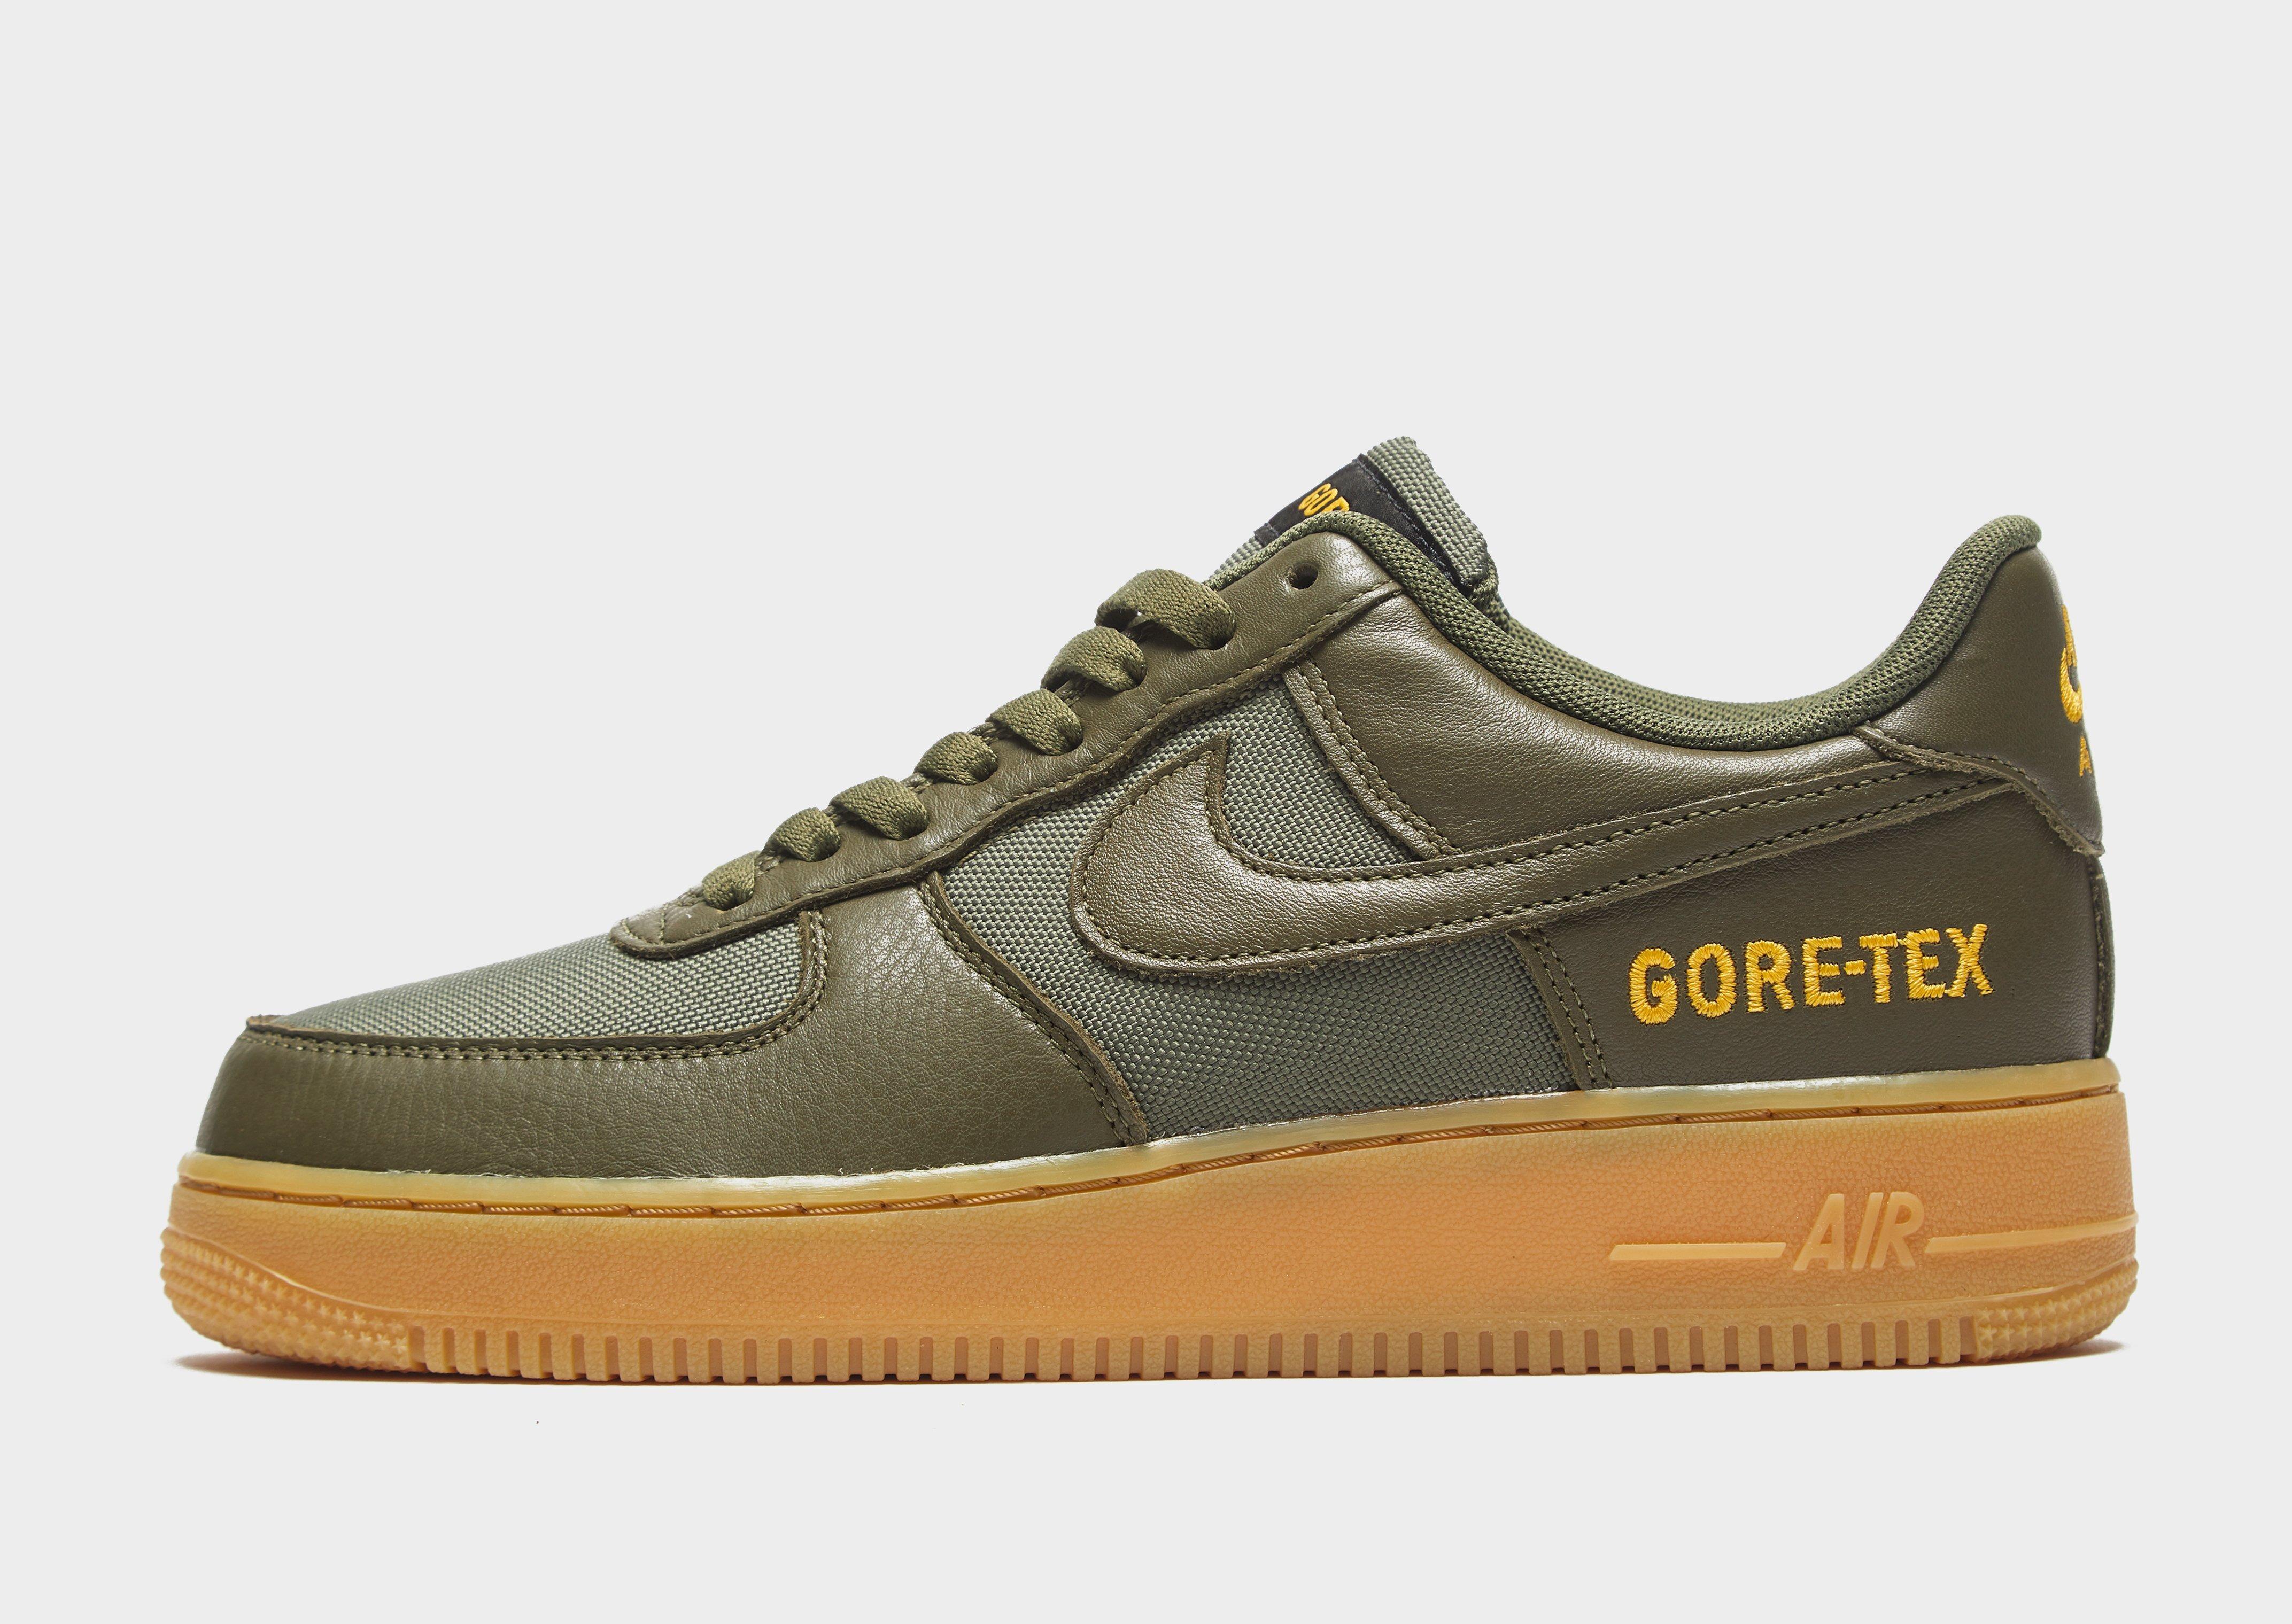 Nike Air Force 1 GORE TEX   JD Sports